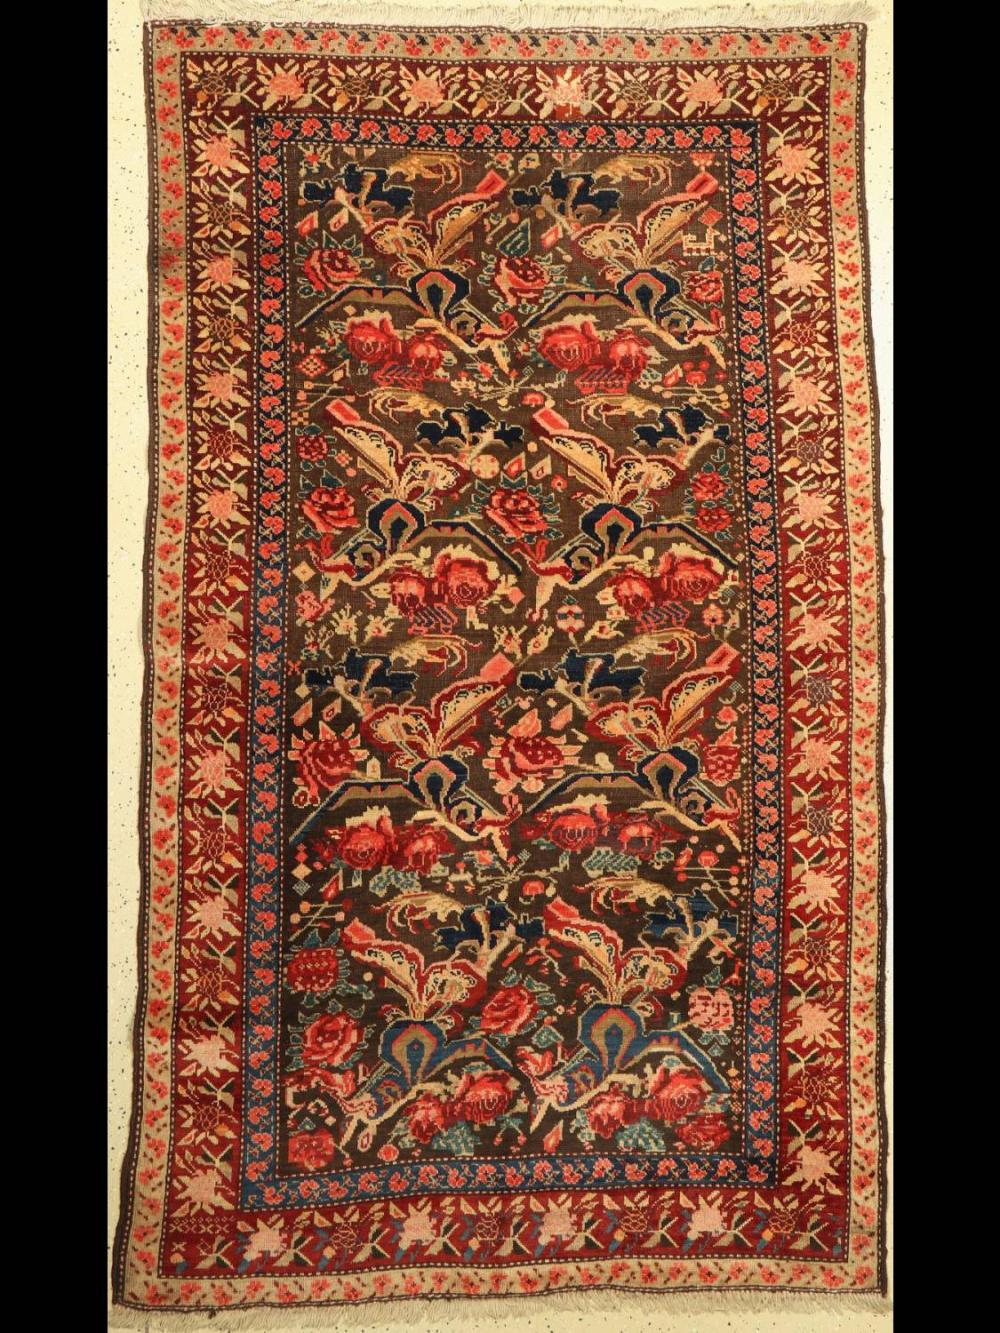 Antique Karabagh, Caucasus, around 1900, wool knotted on